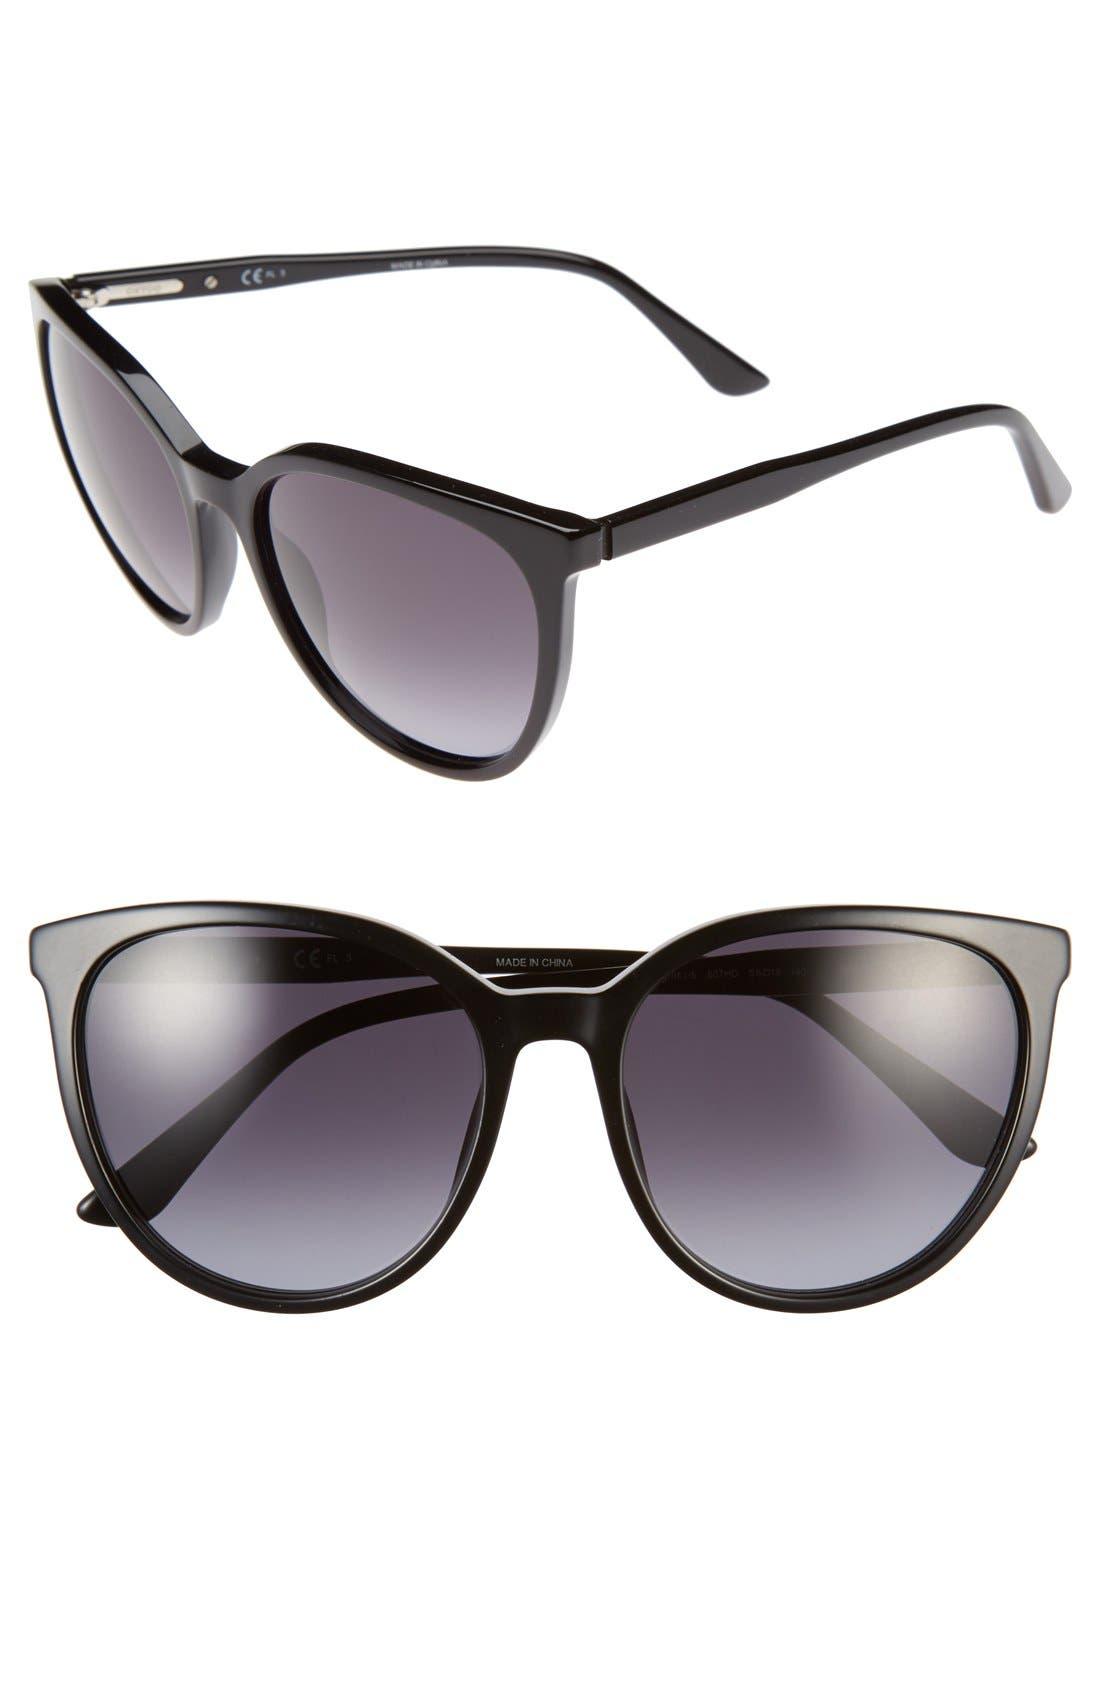 Alternate Image 1 Selected - Oxydo 56mm Retro Sunglasses